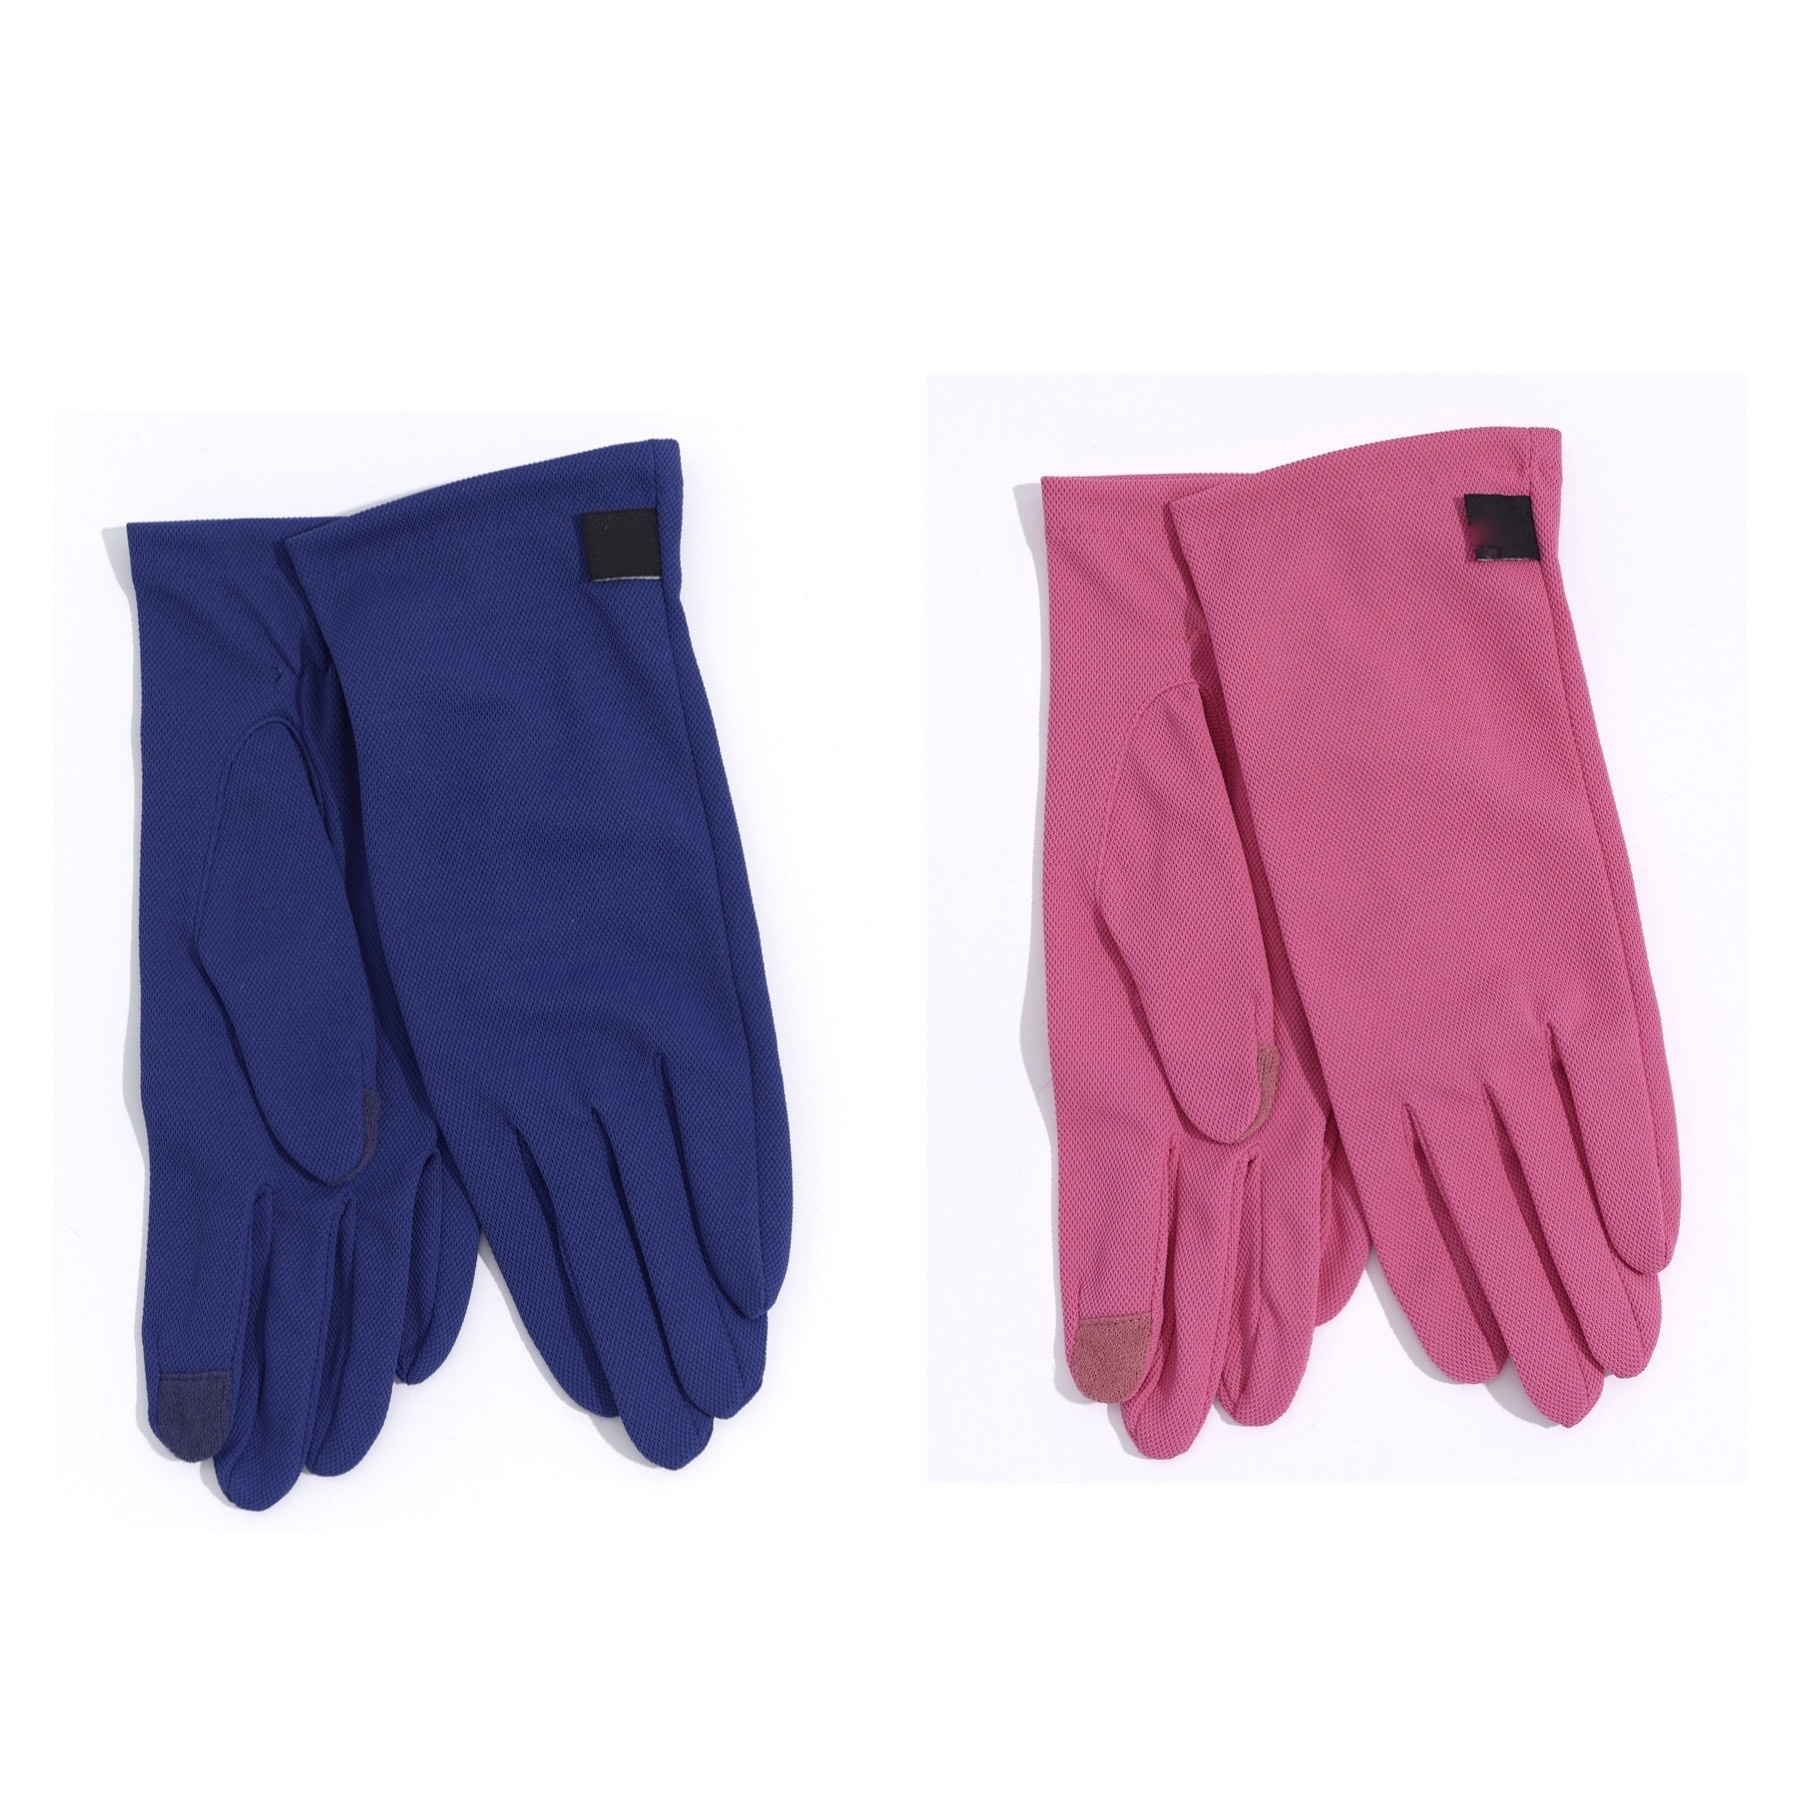 Errand Gloves- Washable